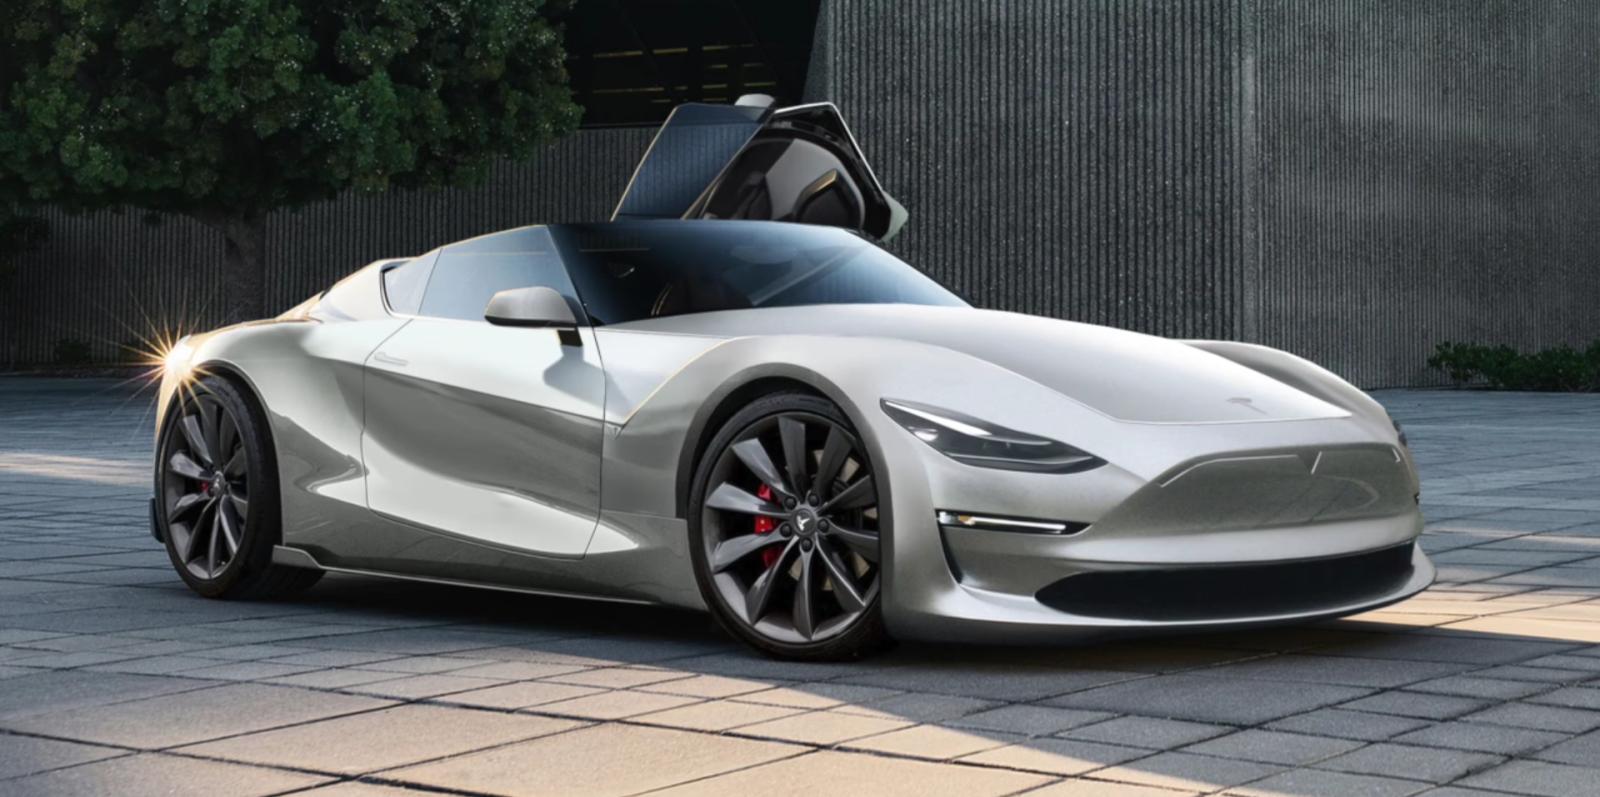 Tesla Roadster Next Gen Elon Musk Considers Mph Target Under